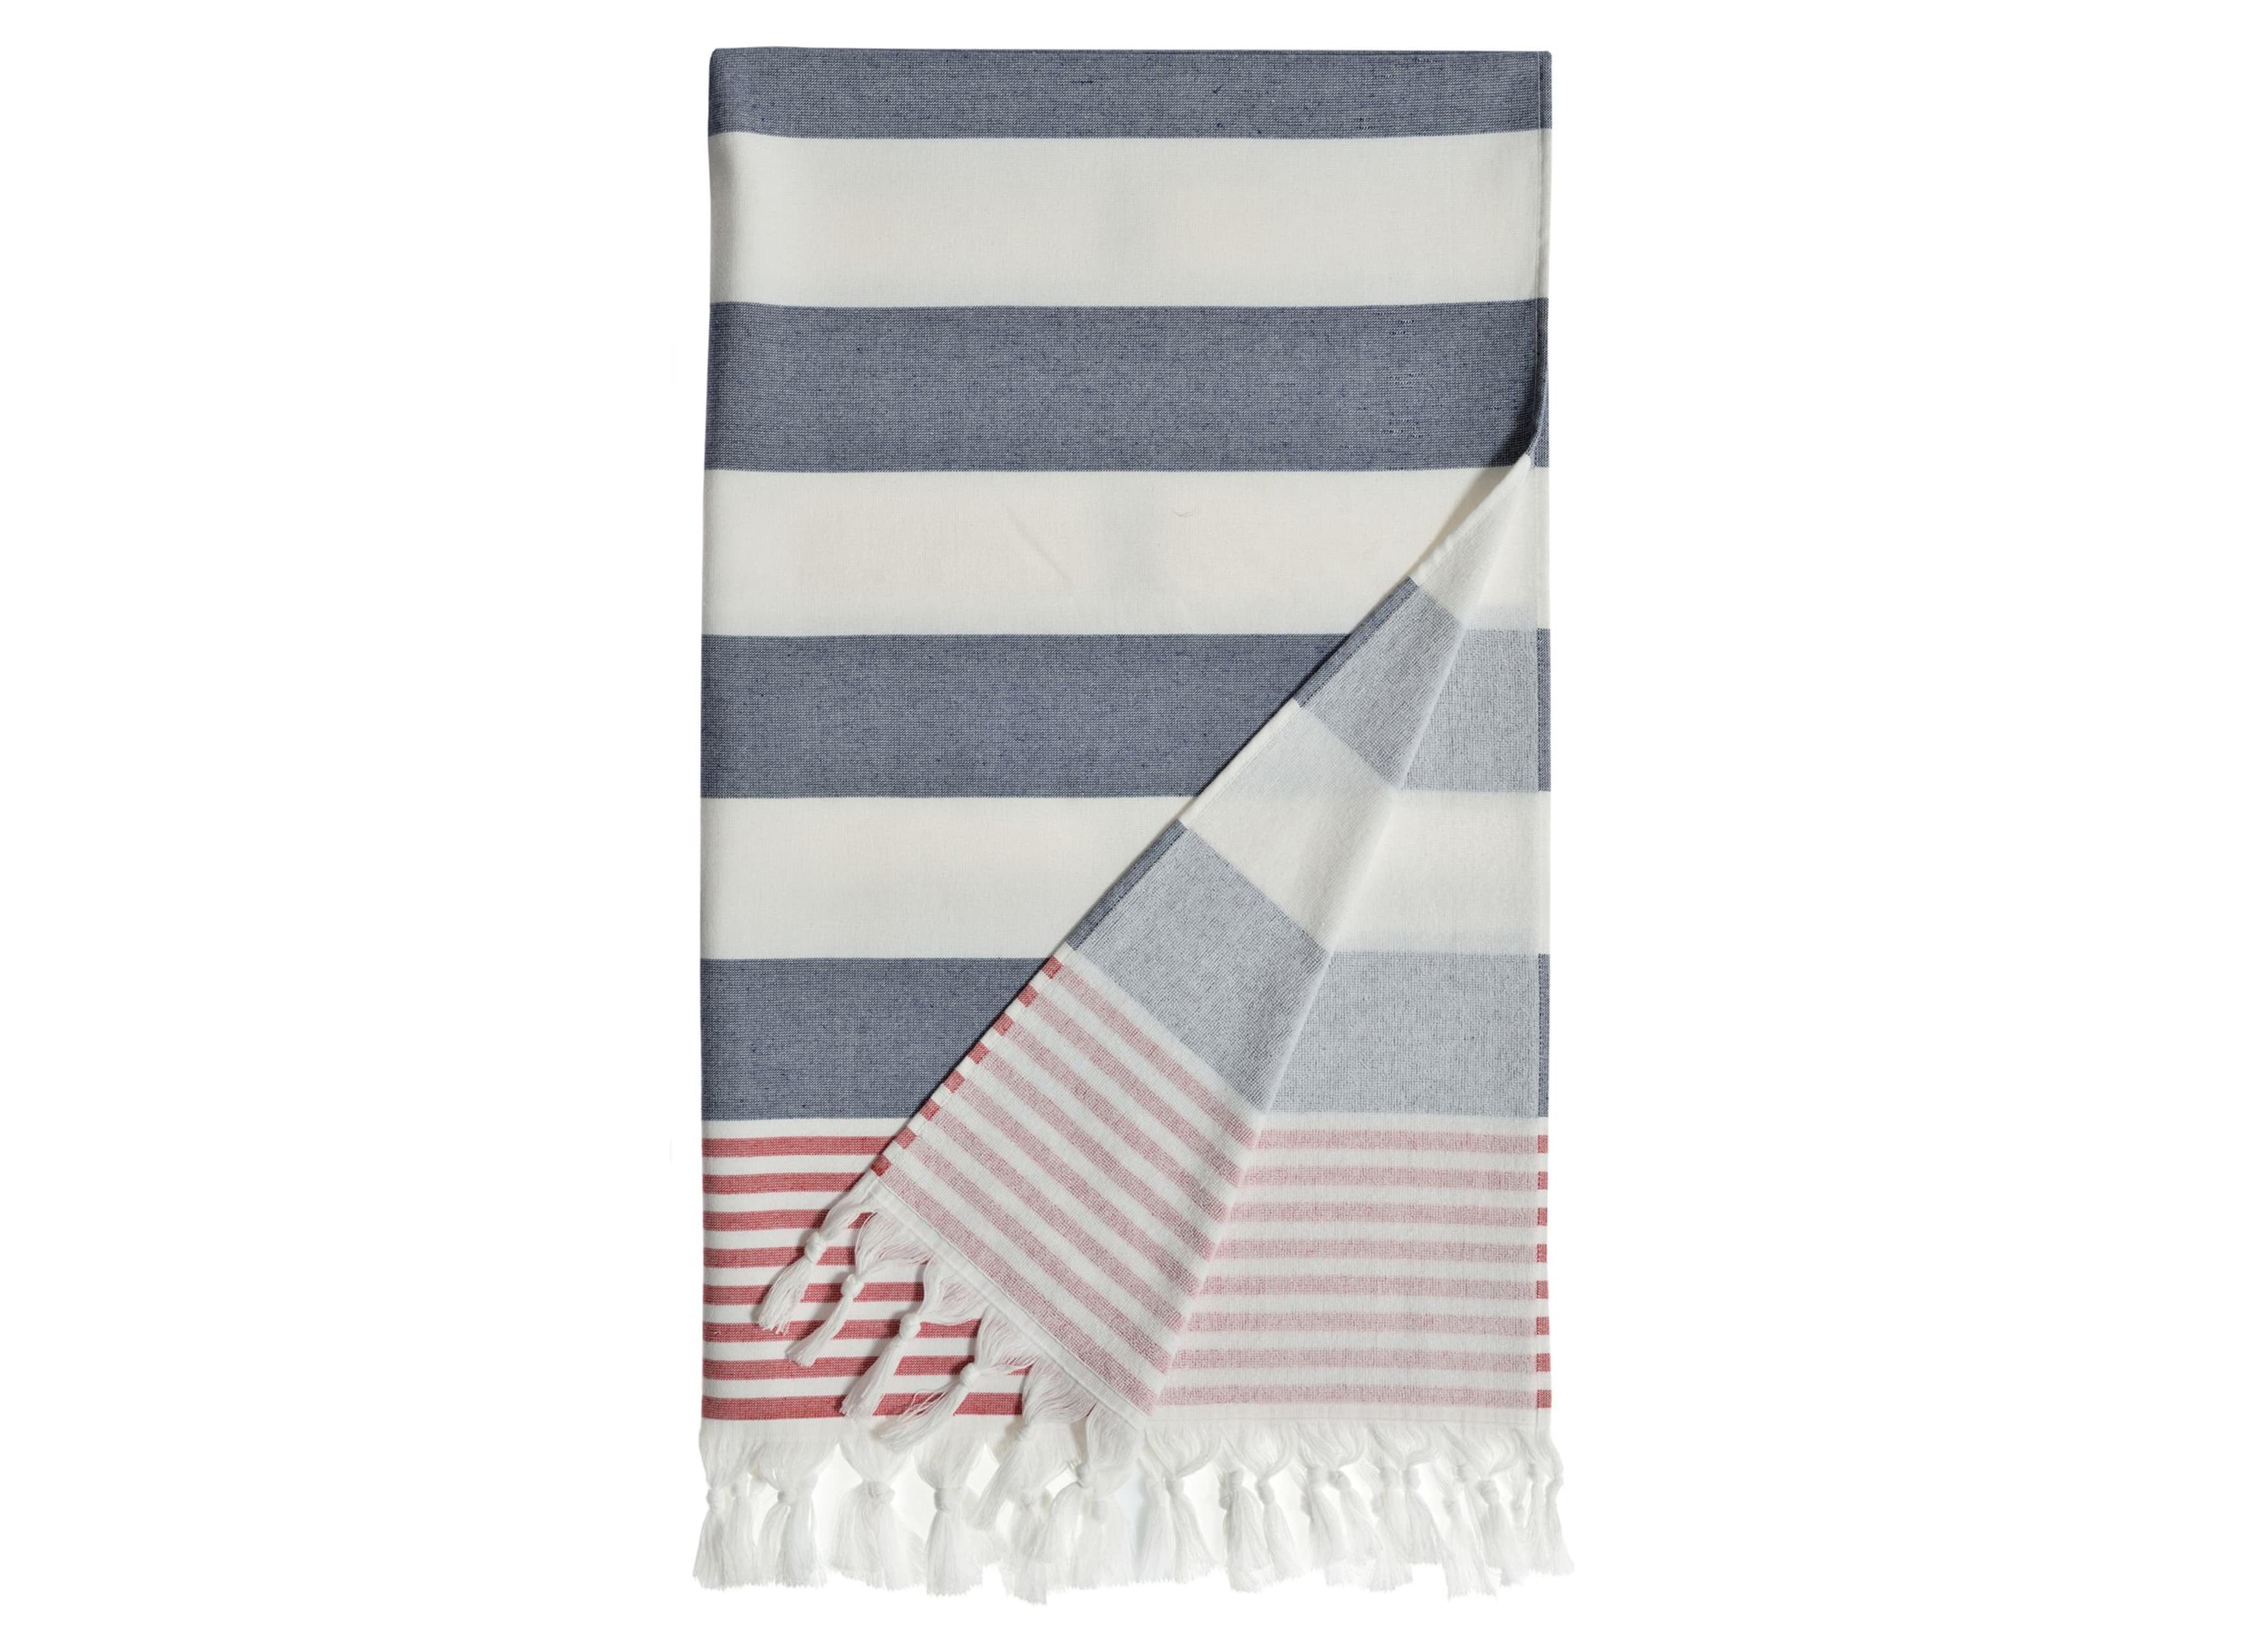 'Patriotic' Turkish Pestemal Towel by Linum Home Textiles